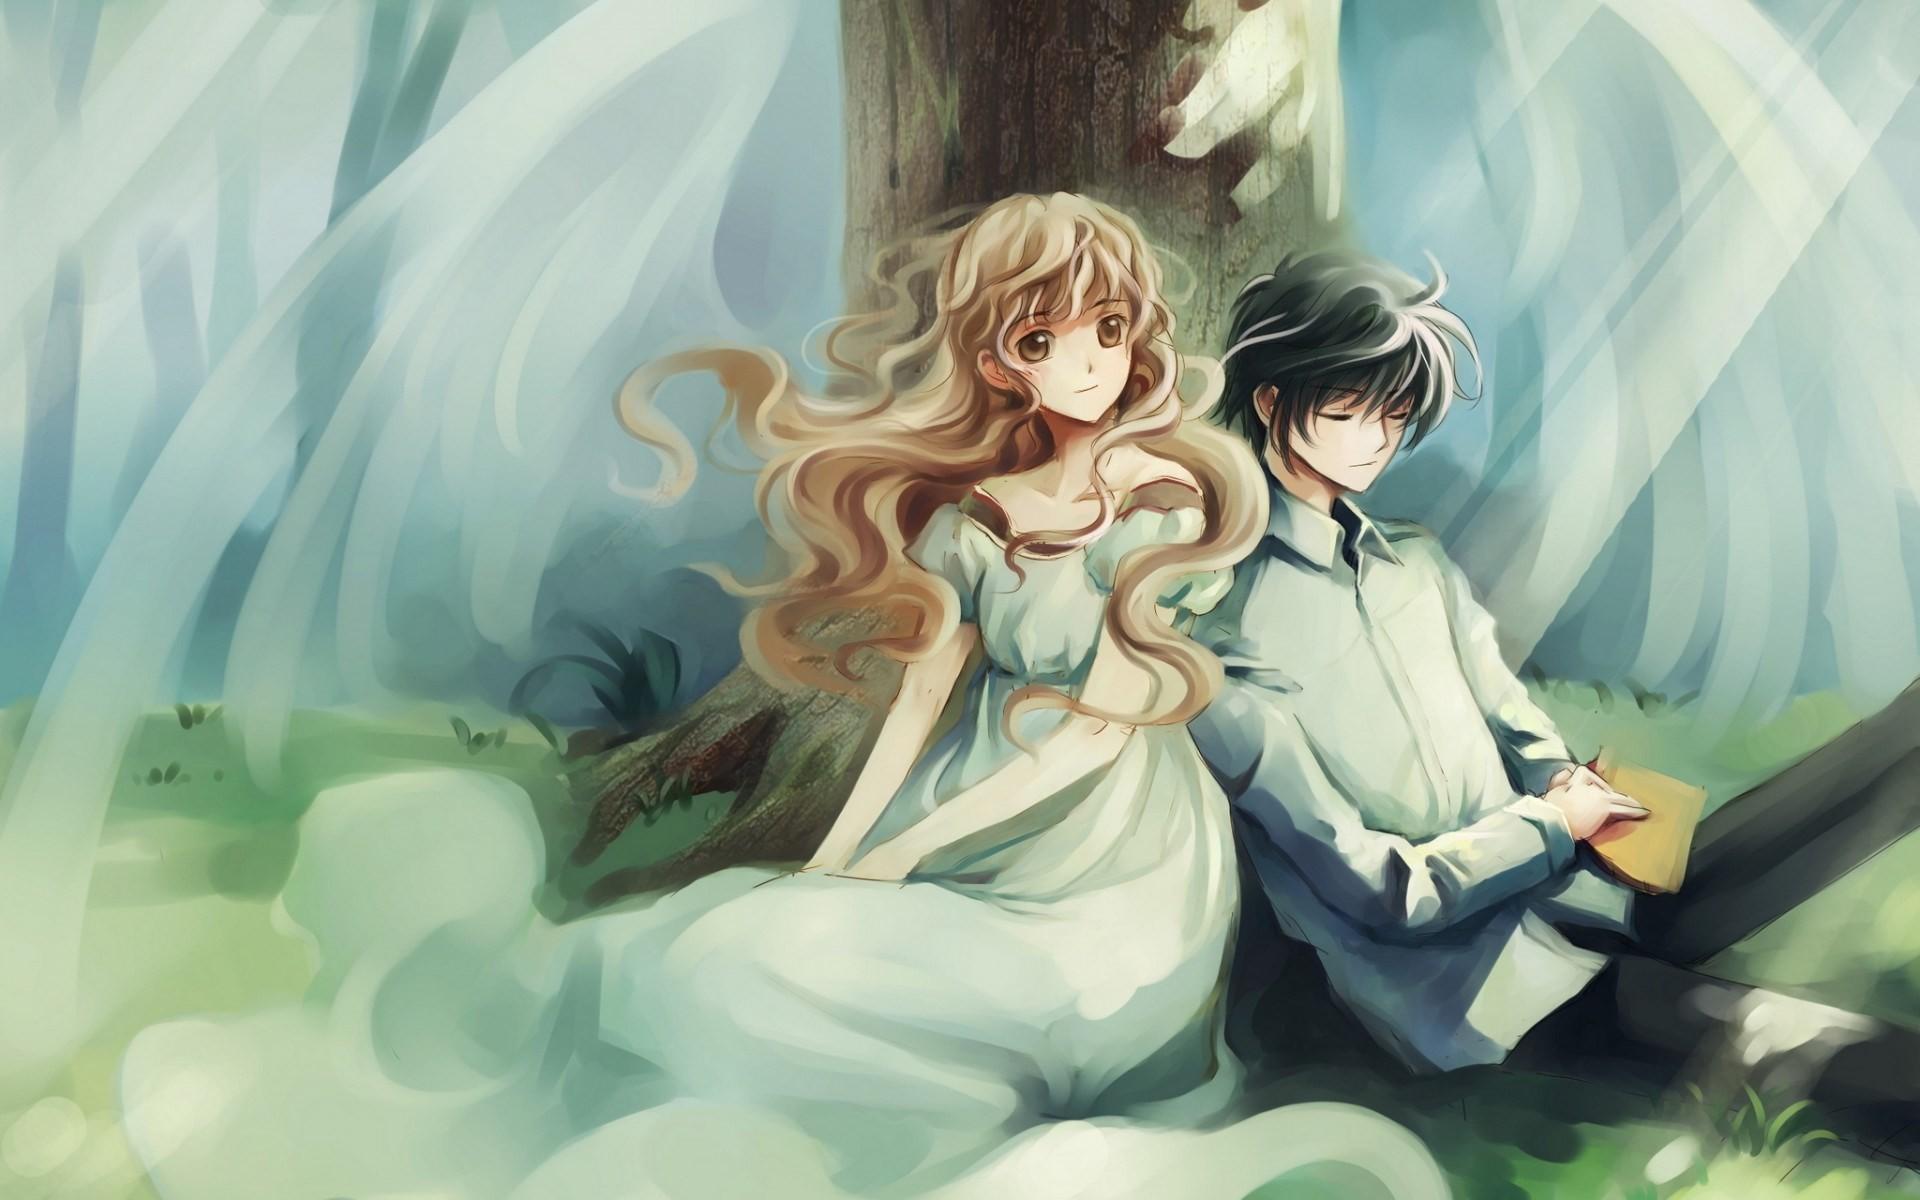 Free Desktop Wallpaper Beautiful Girl And Boy Fairies Anime Couple Wallpaper 74 Images